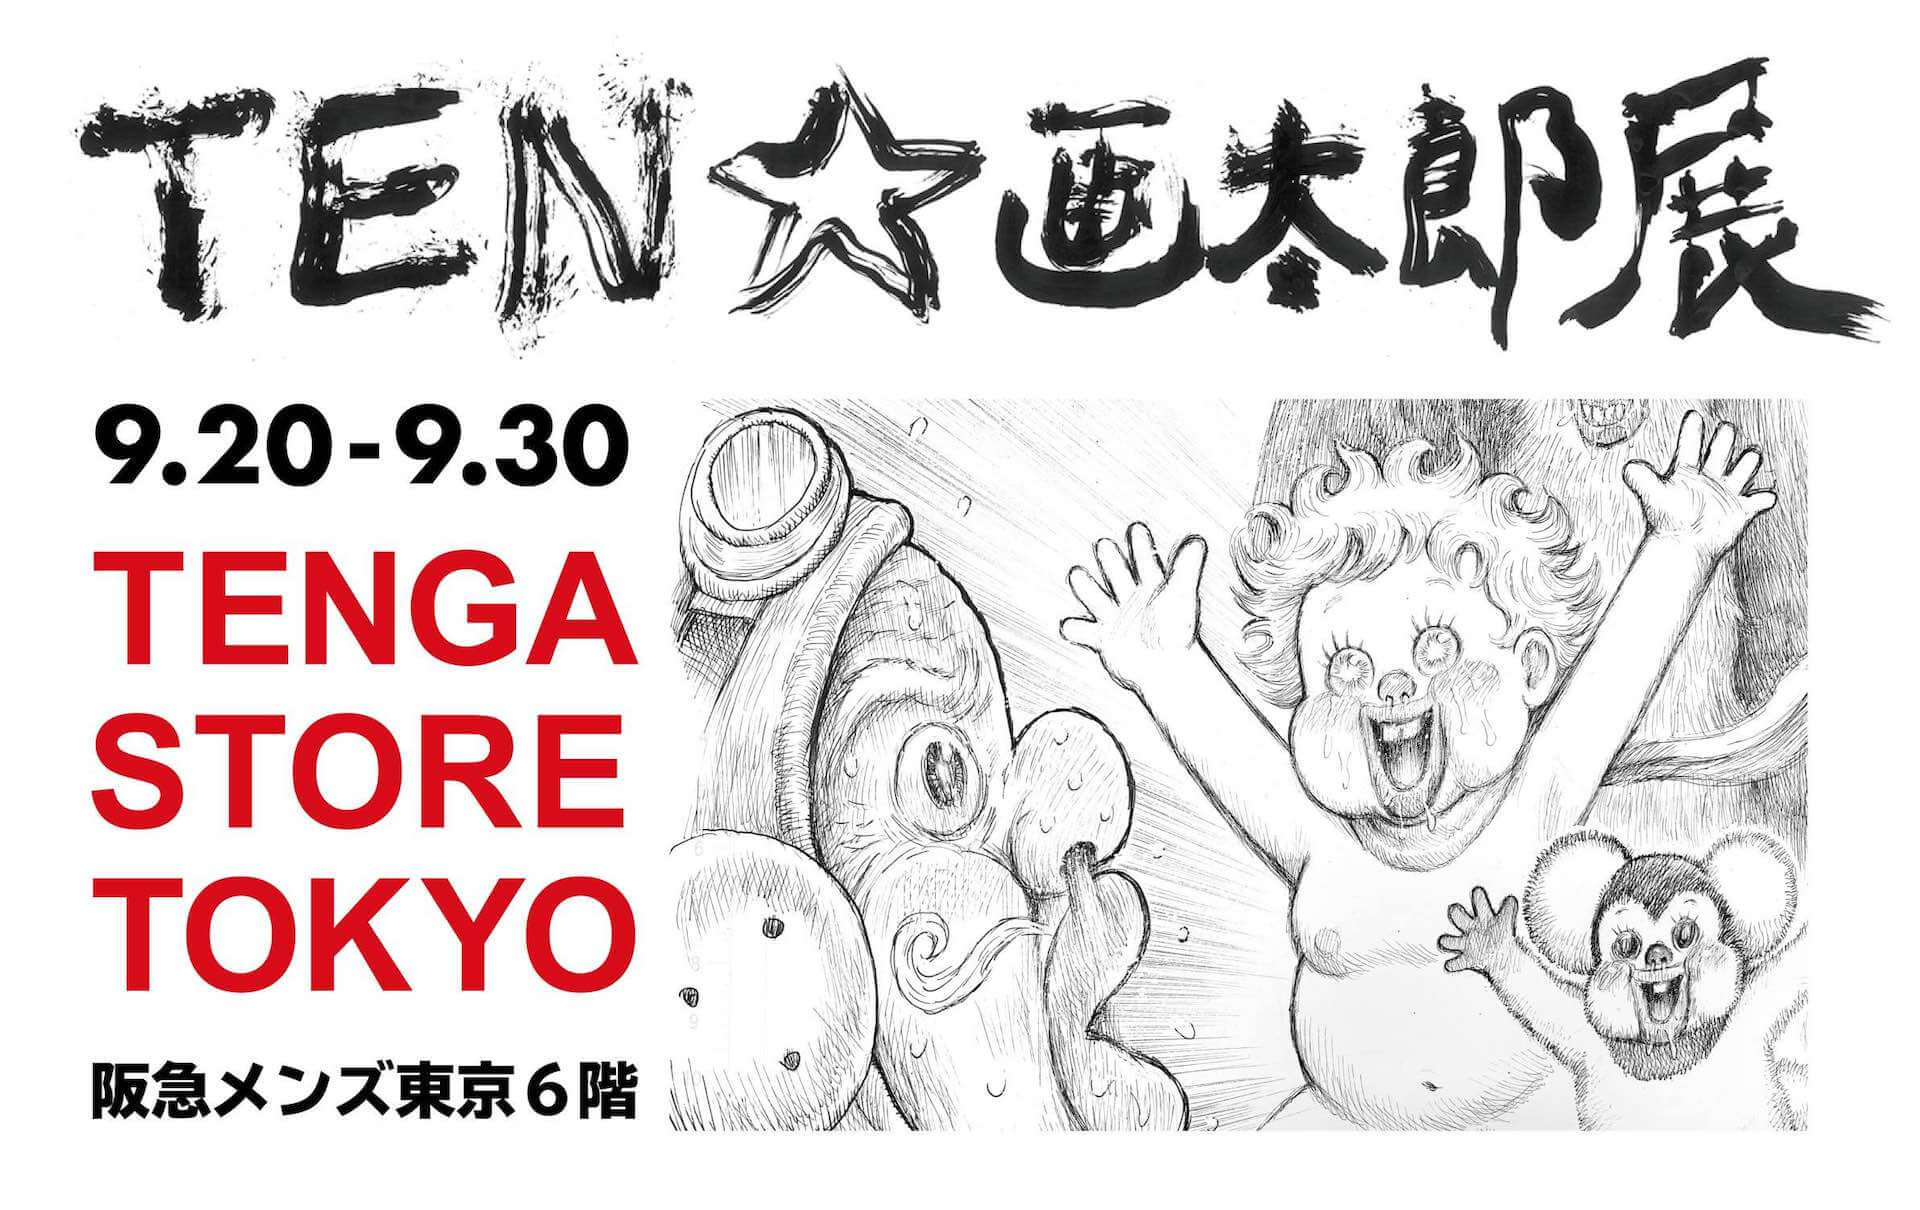 友情、努力、〇〇!TENGA×漫☆画太郎の作品展「TEN☆画太郎展」が開催 music190919-tengataro-2